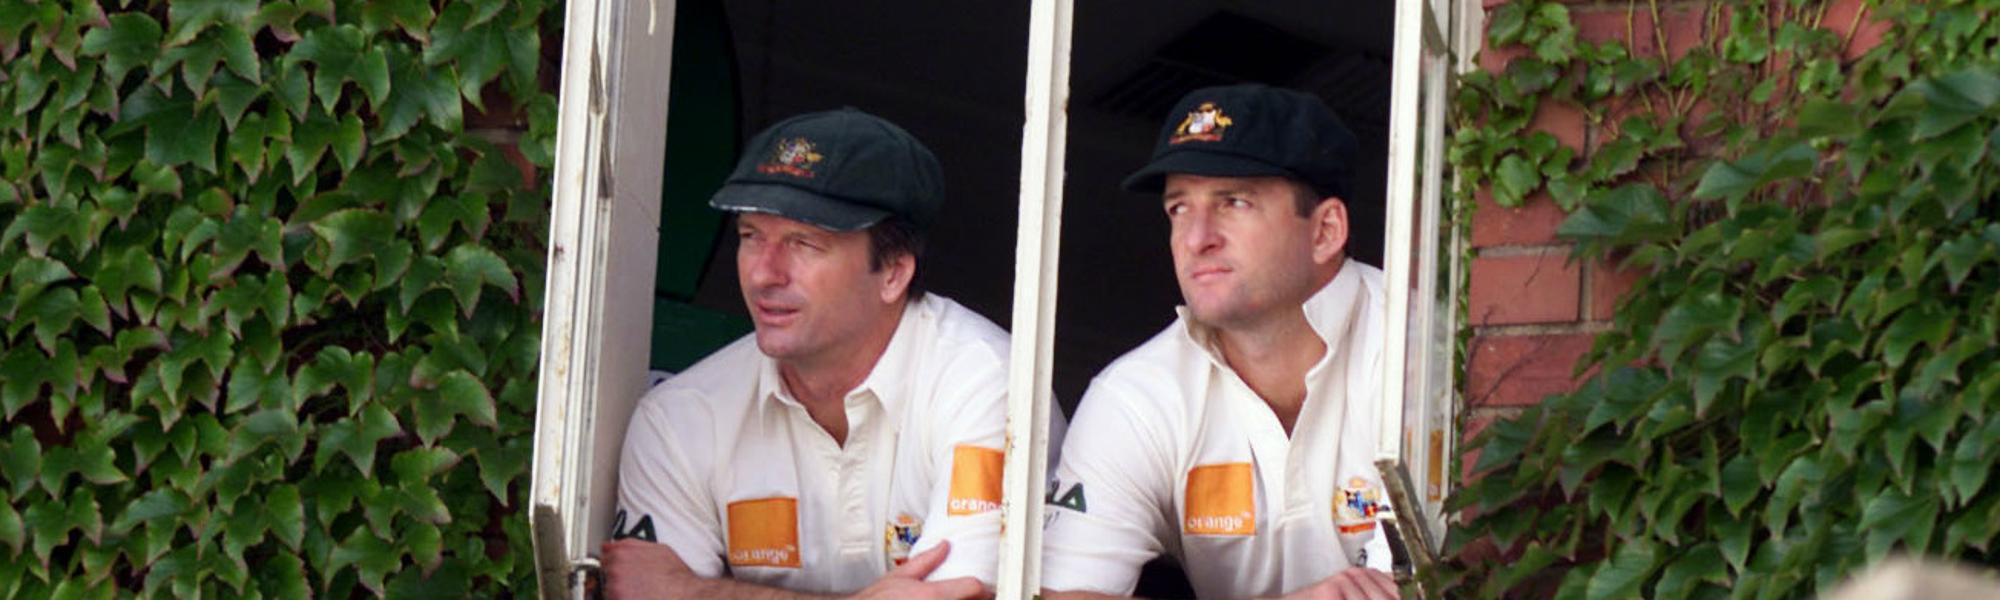 Steve Waugh and Mark Waugh